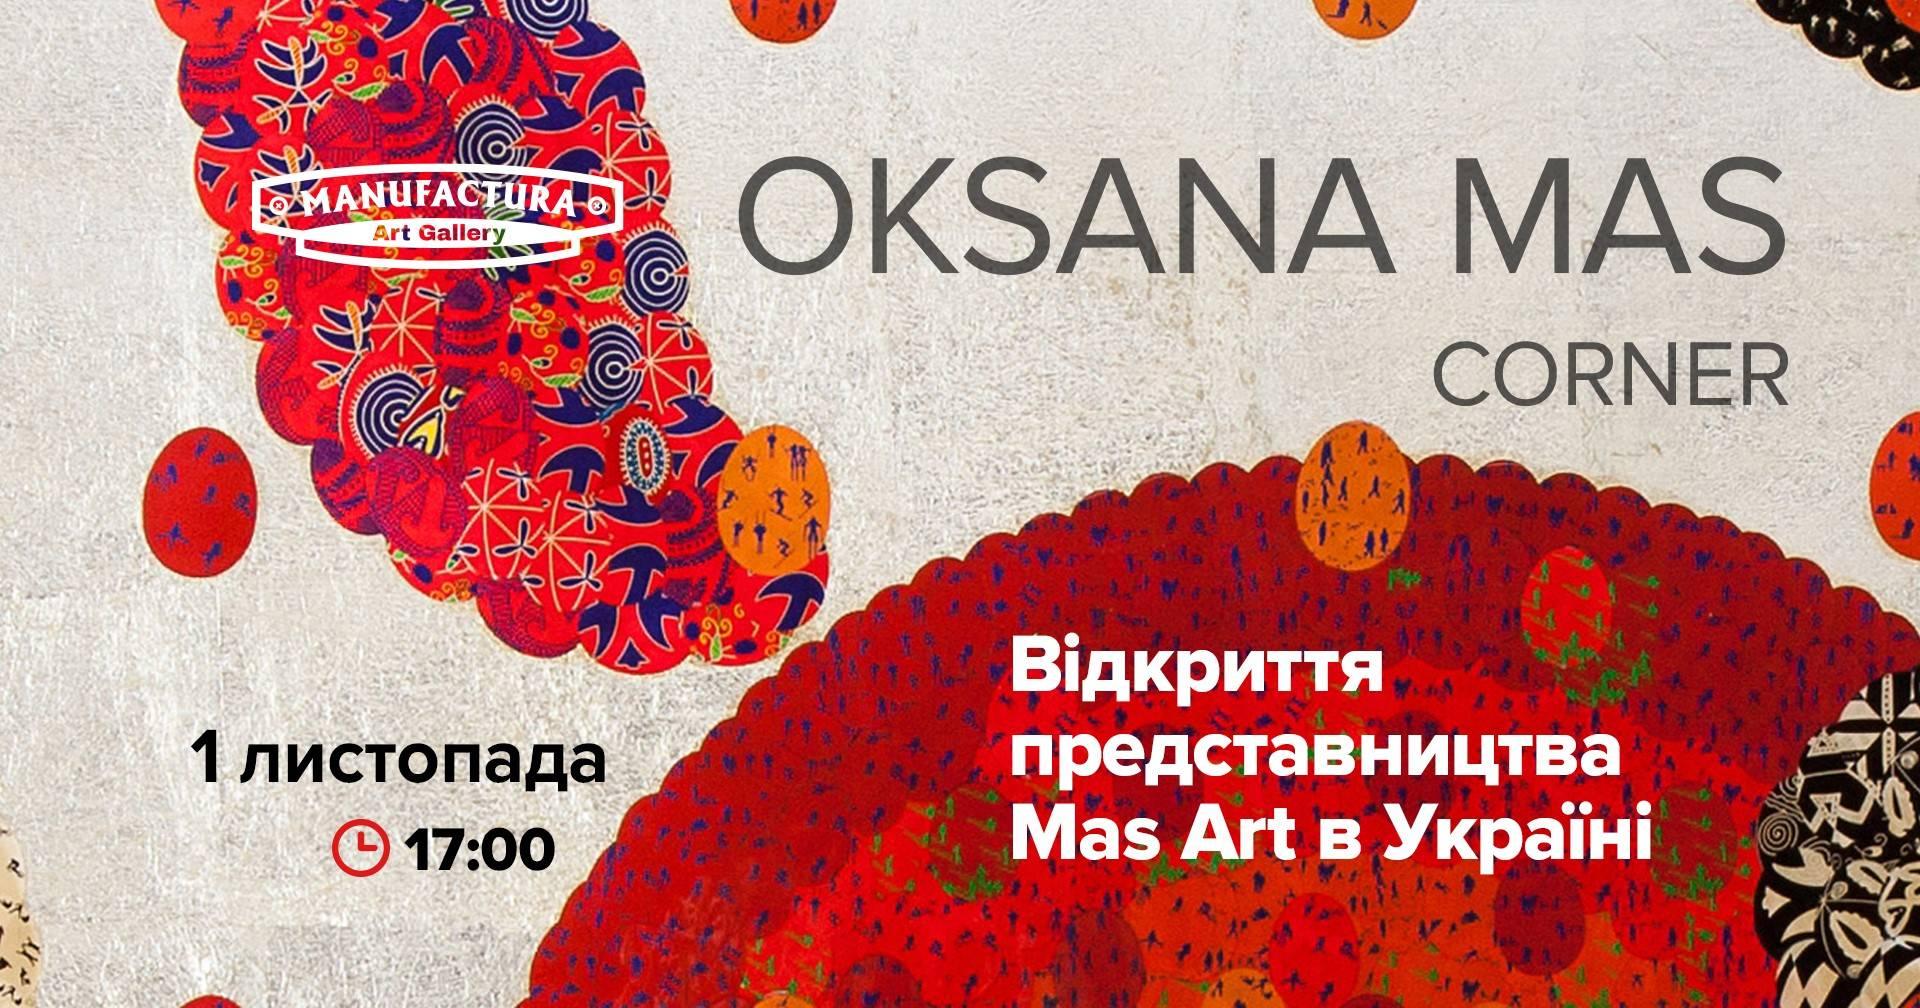 Оксана Мась в арт-галереї «Мануфактура»